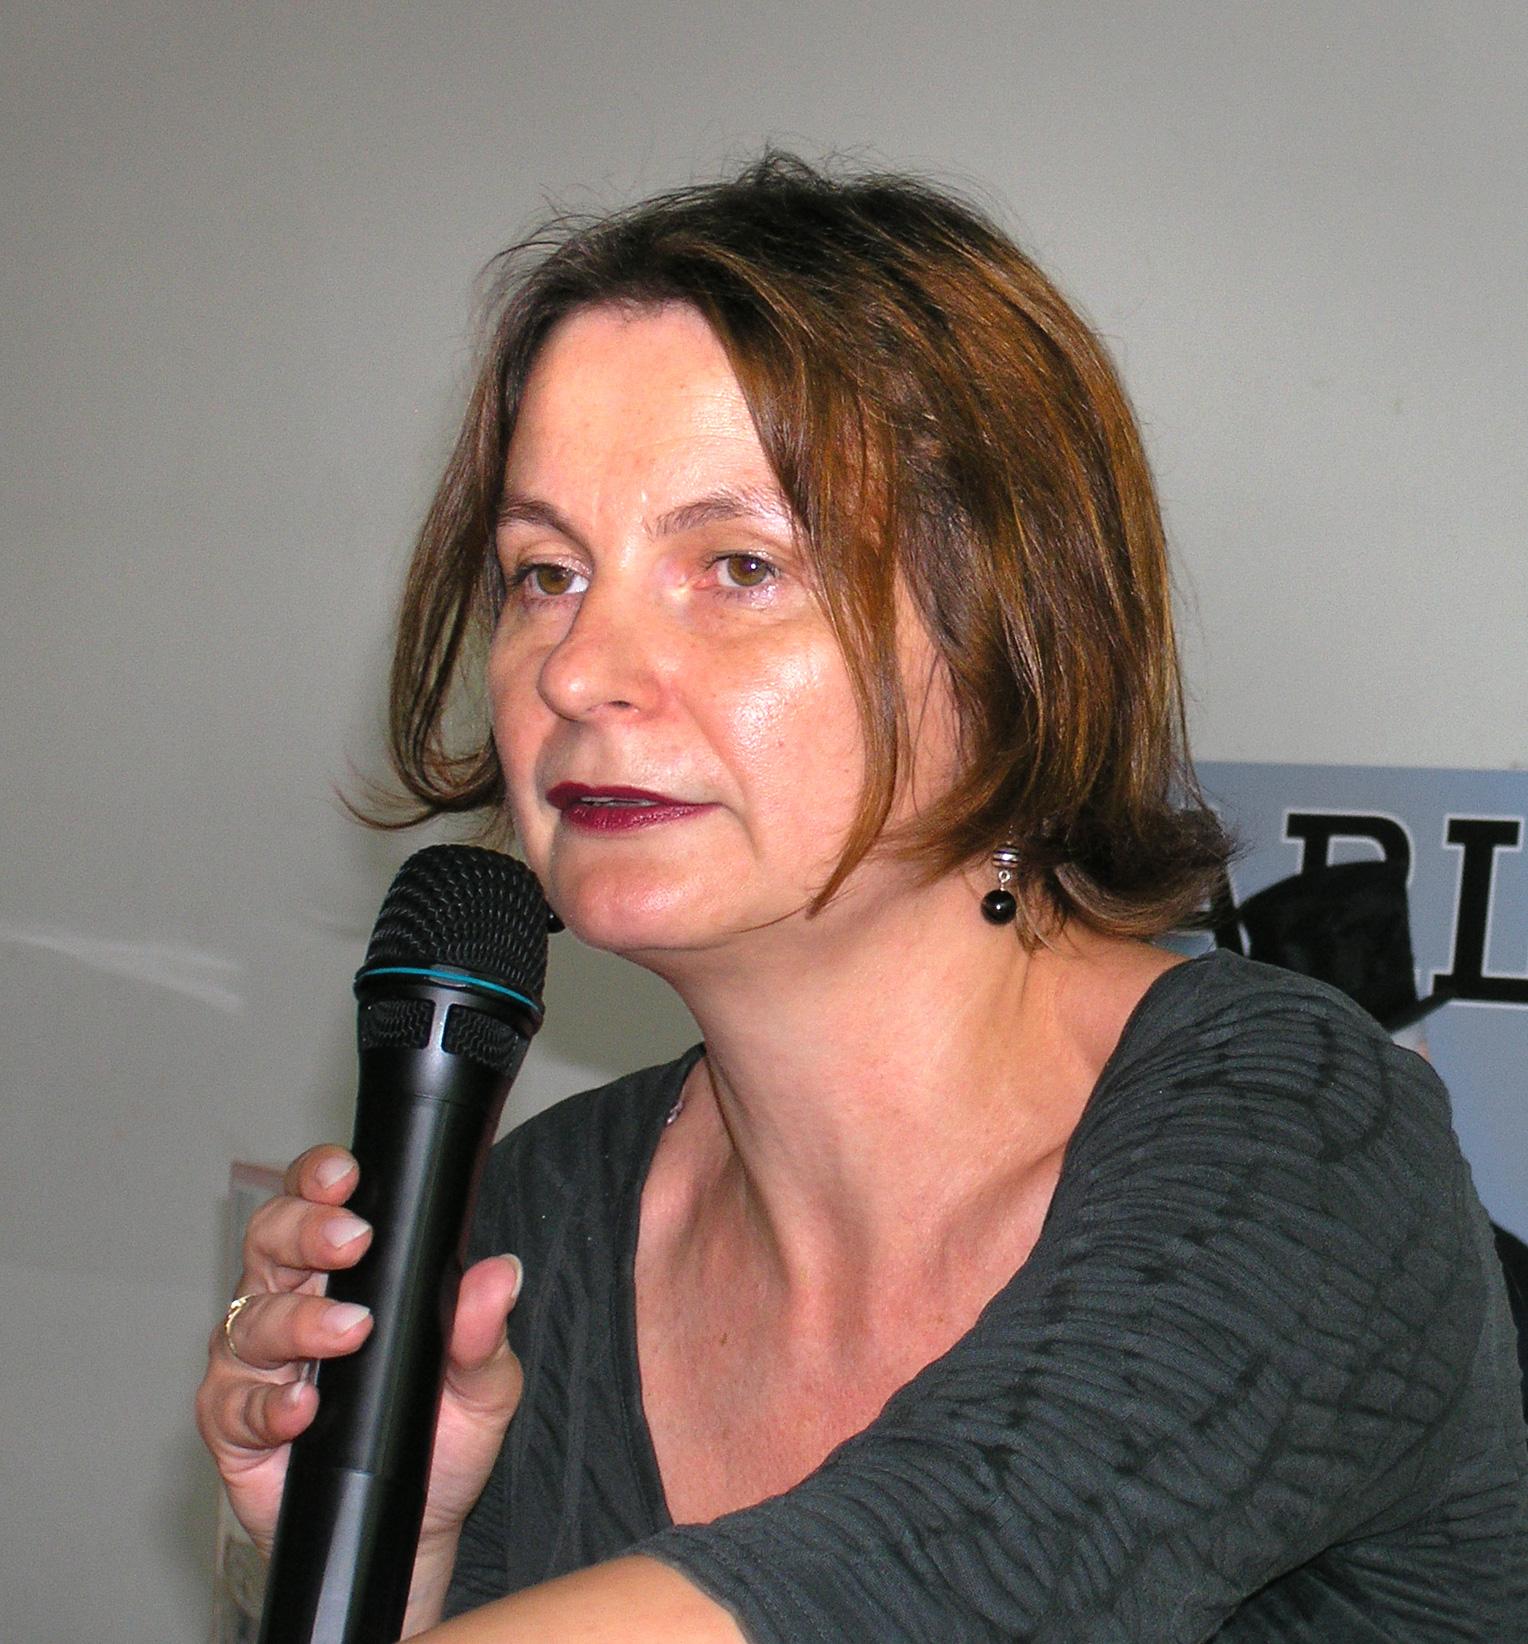 Radka Denemarková, 2011